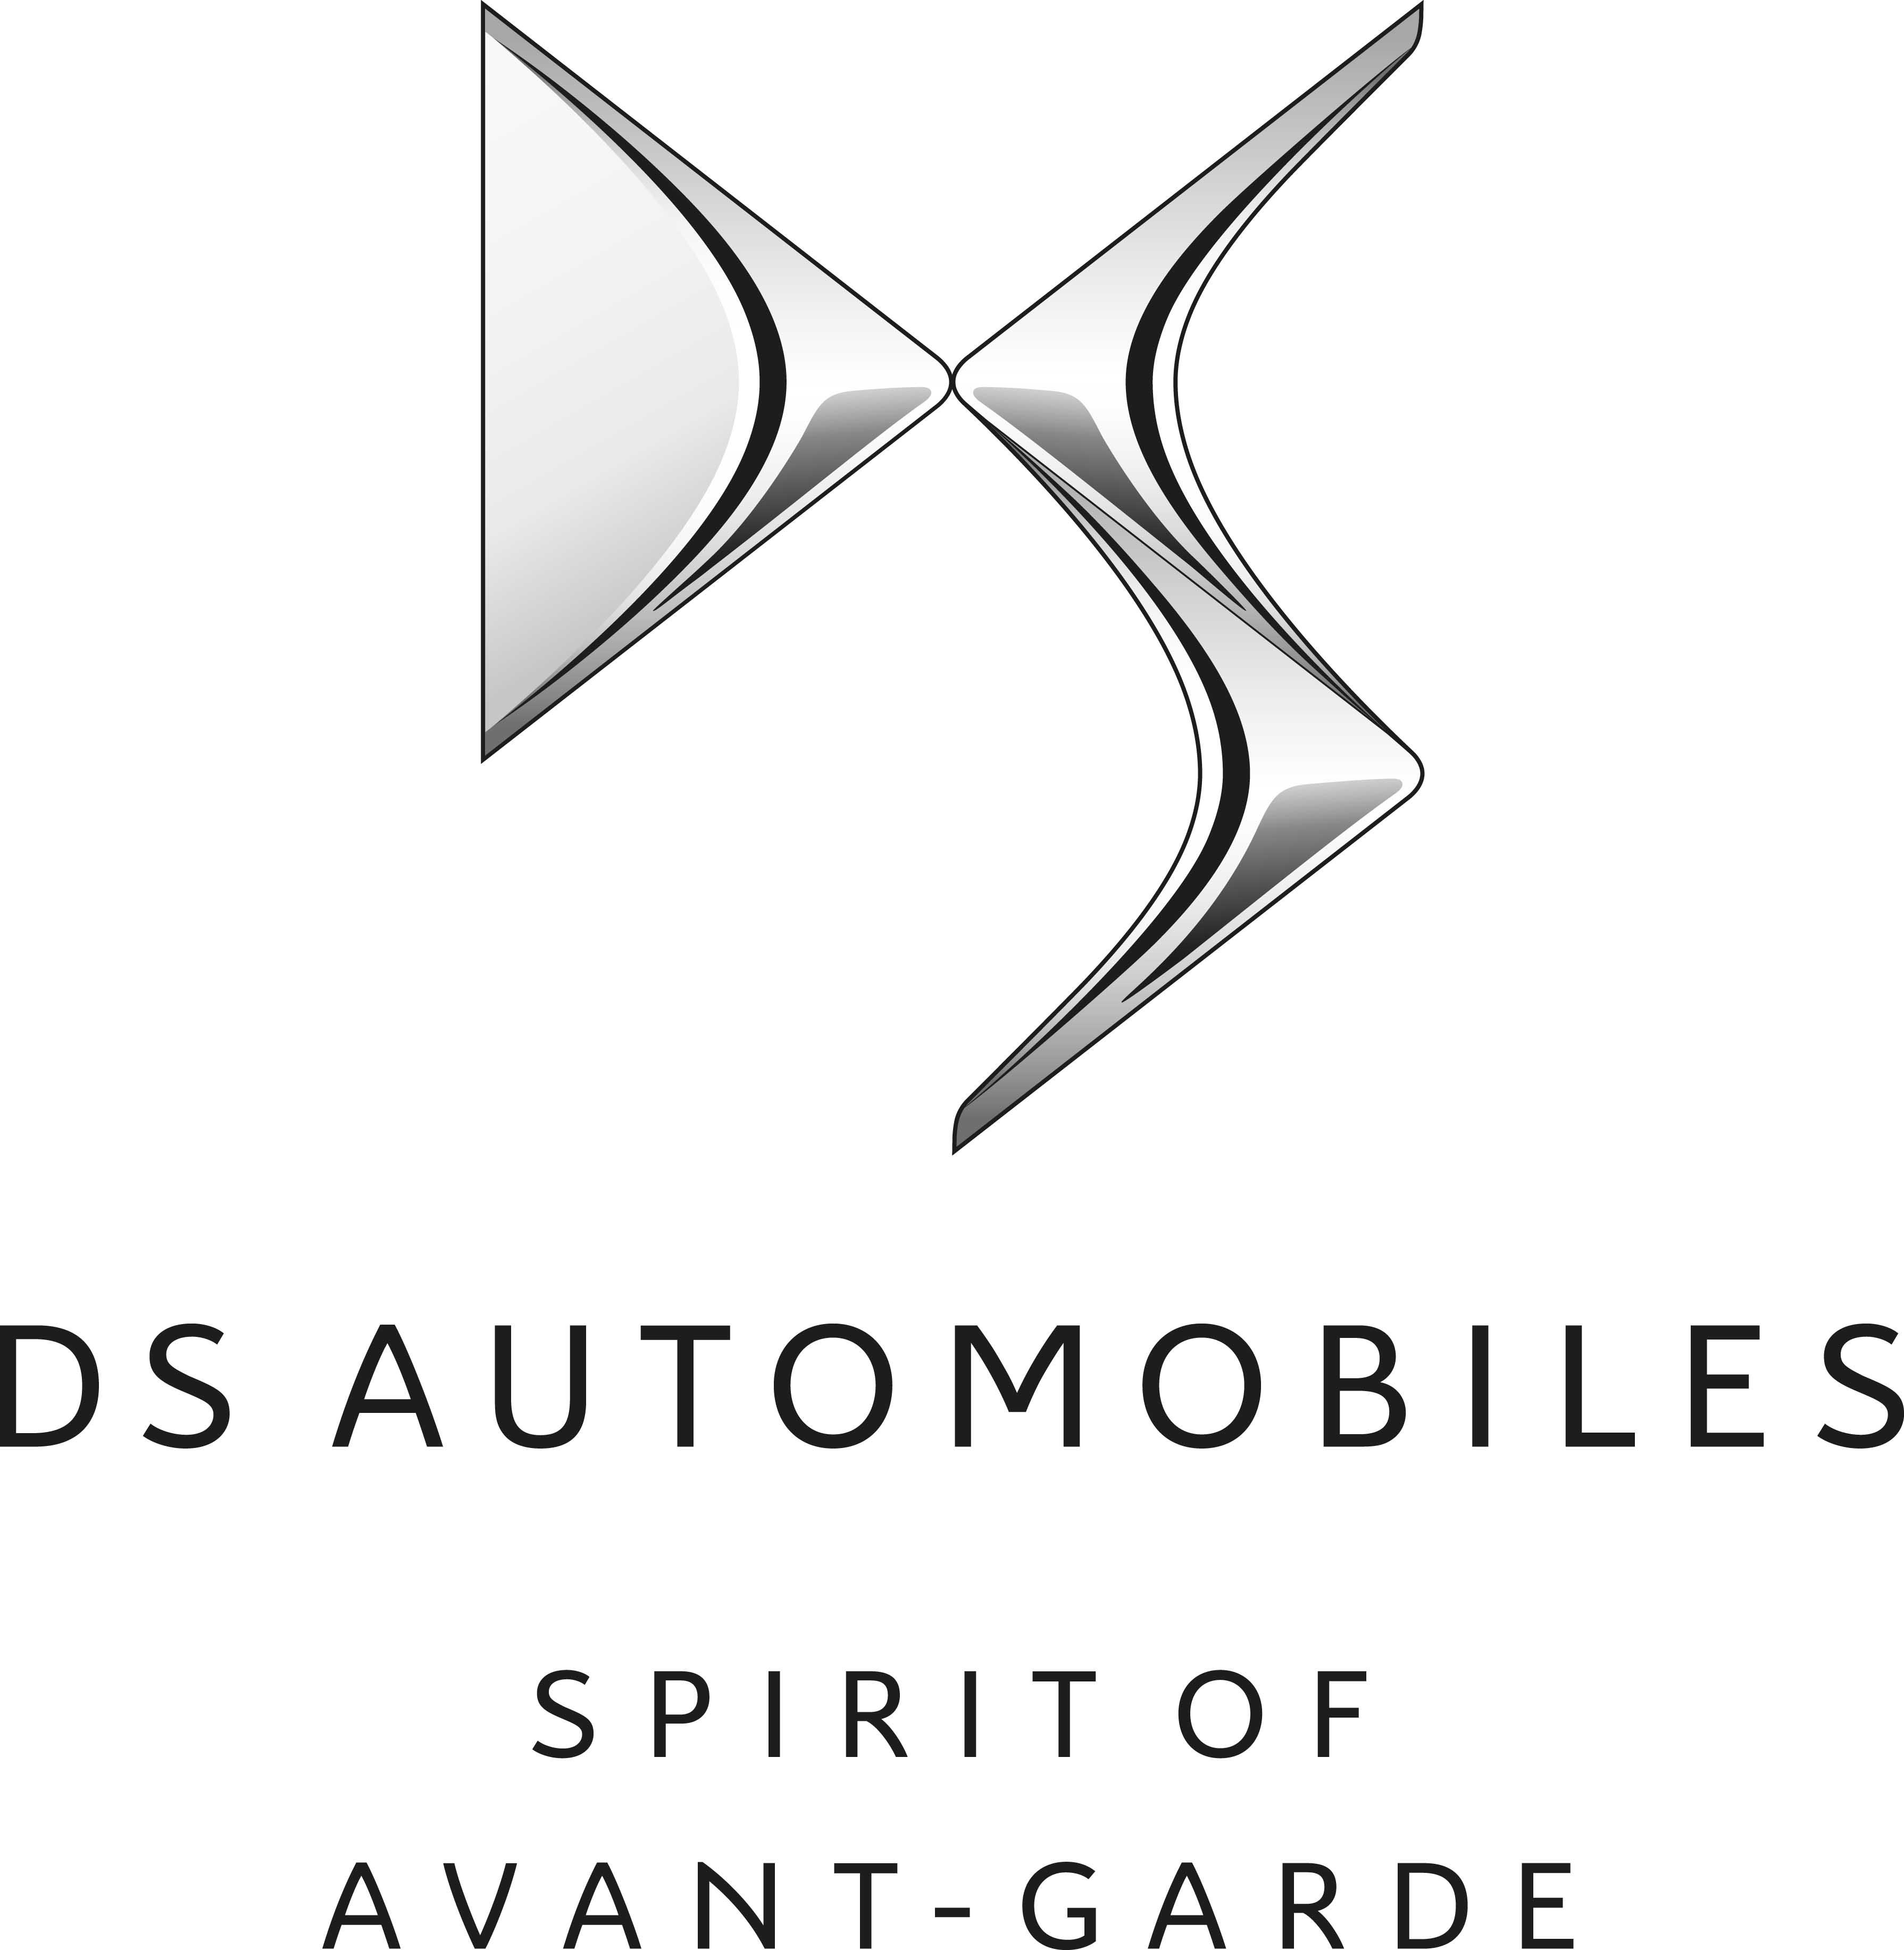 DS AUTOMOBILES ist Sponsor der Classic Days Berlin